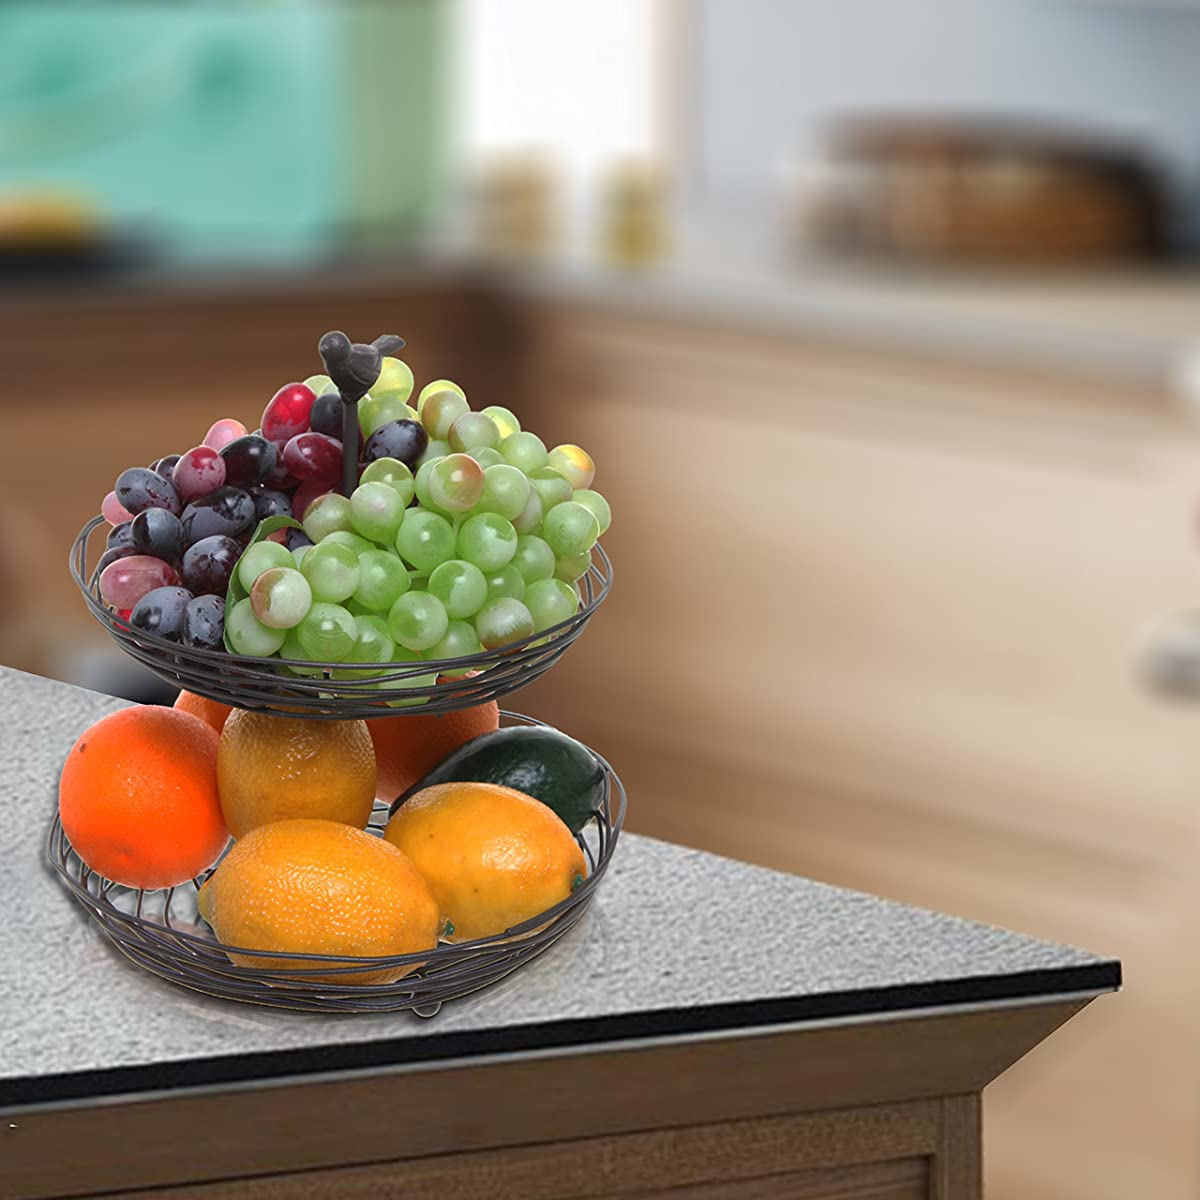 Black Metal Bird Nest Design 2 Tier Kitchen Produce & Fruit Basket / Decorative Display Stand - MyGift